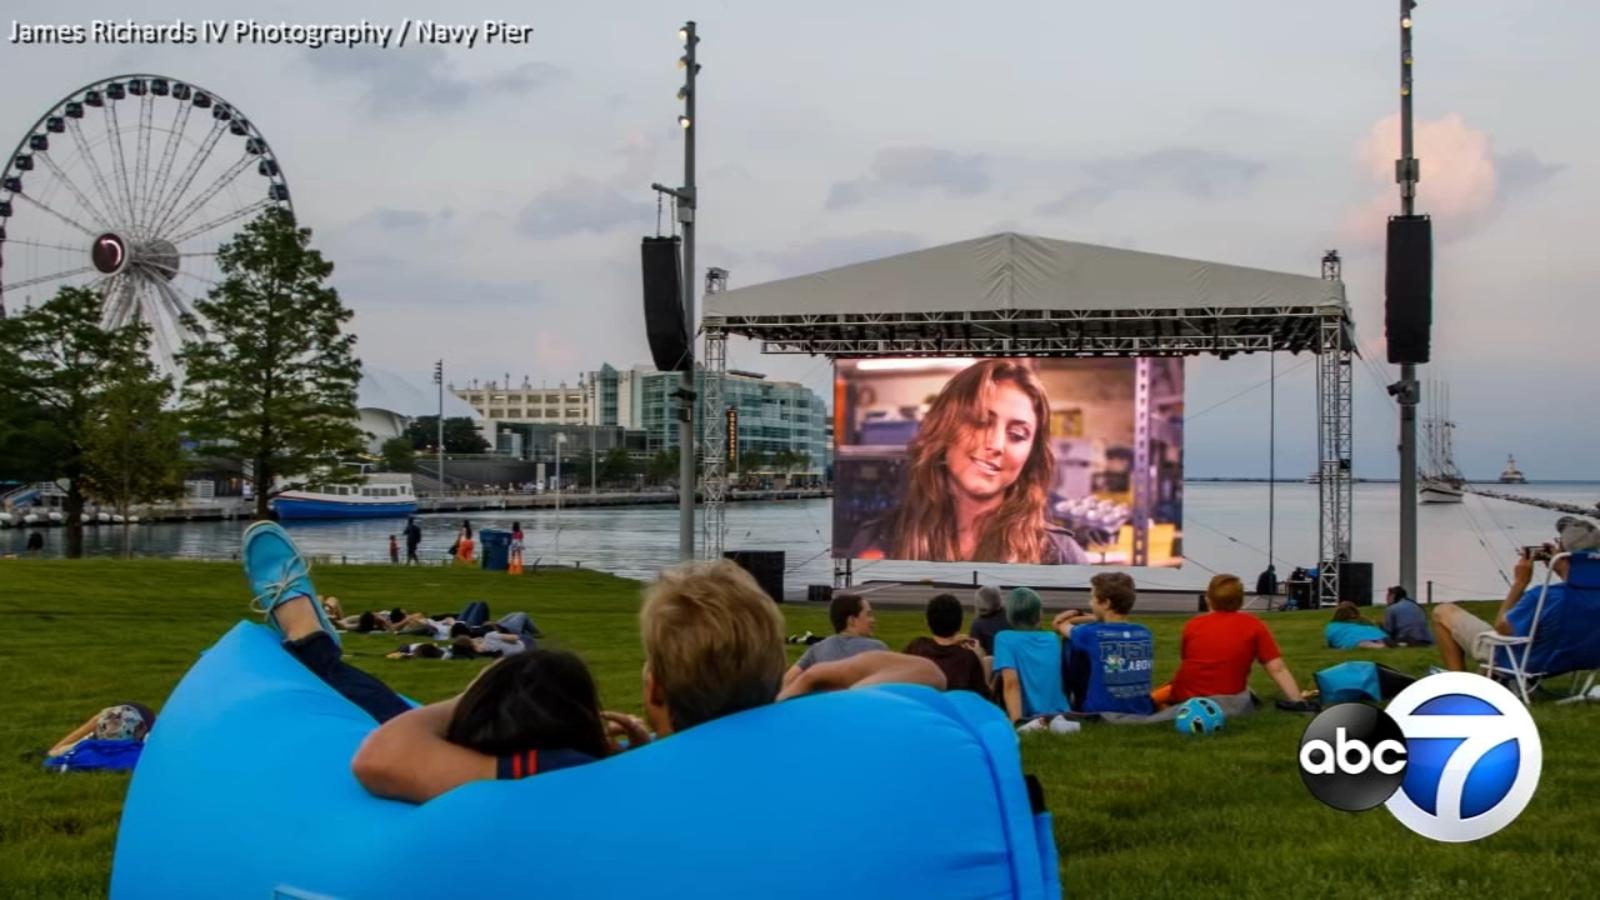 Navy Pier's 'Water Flicks' has a super lineup this summer